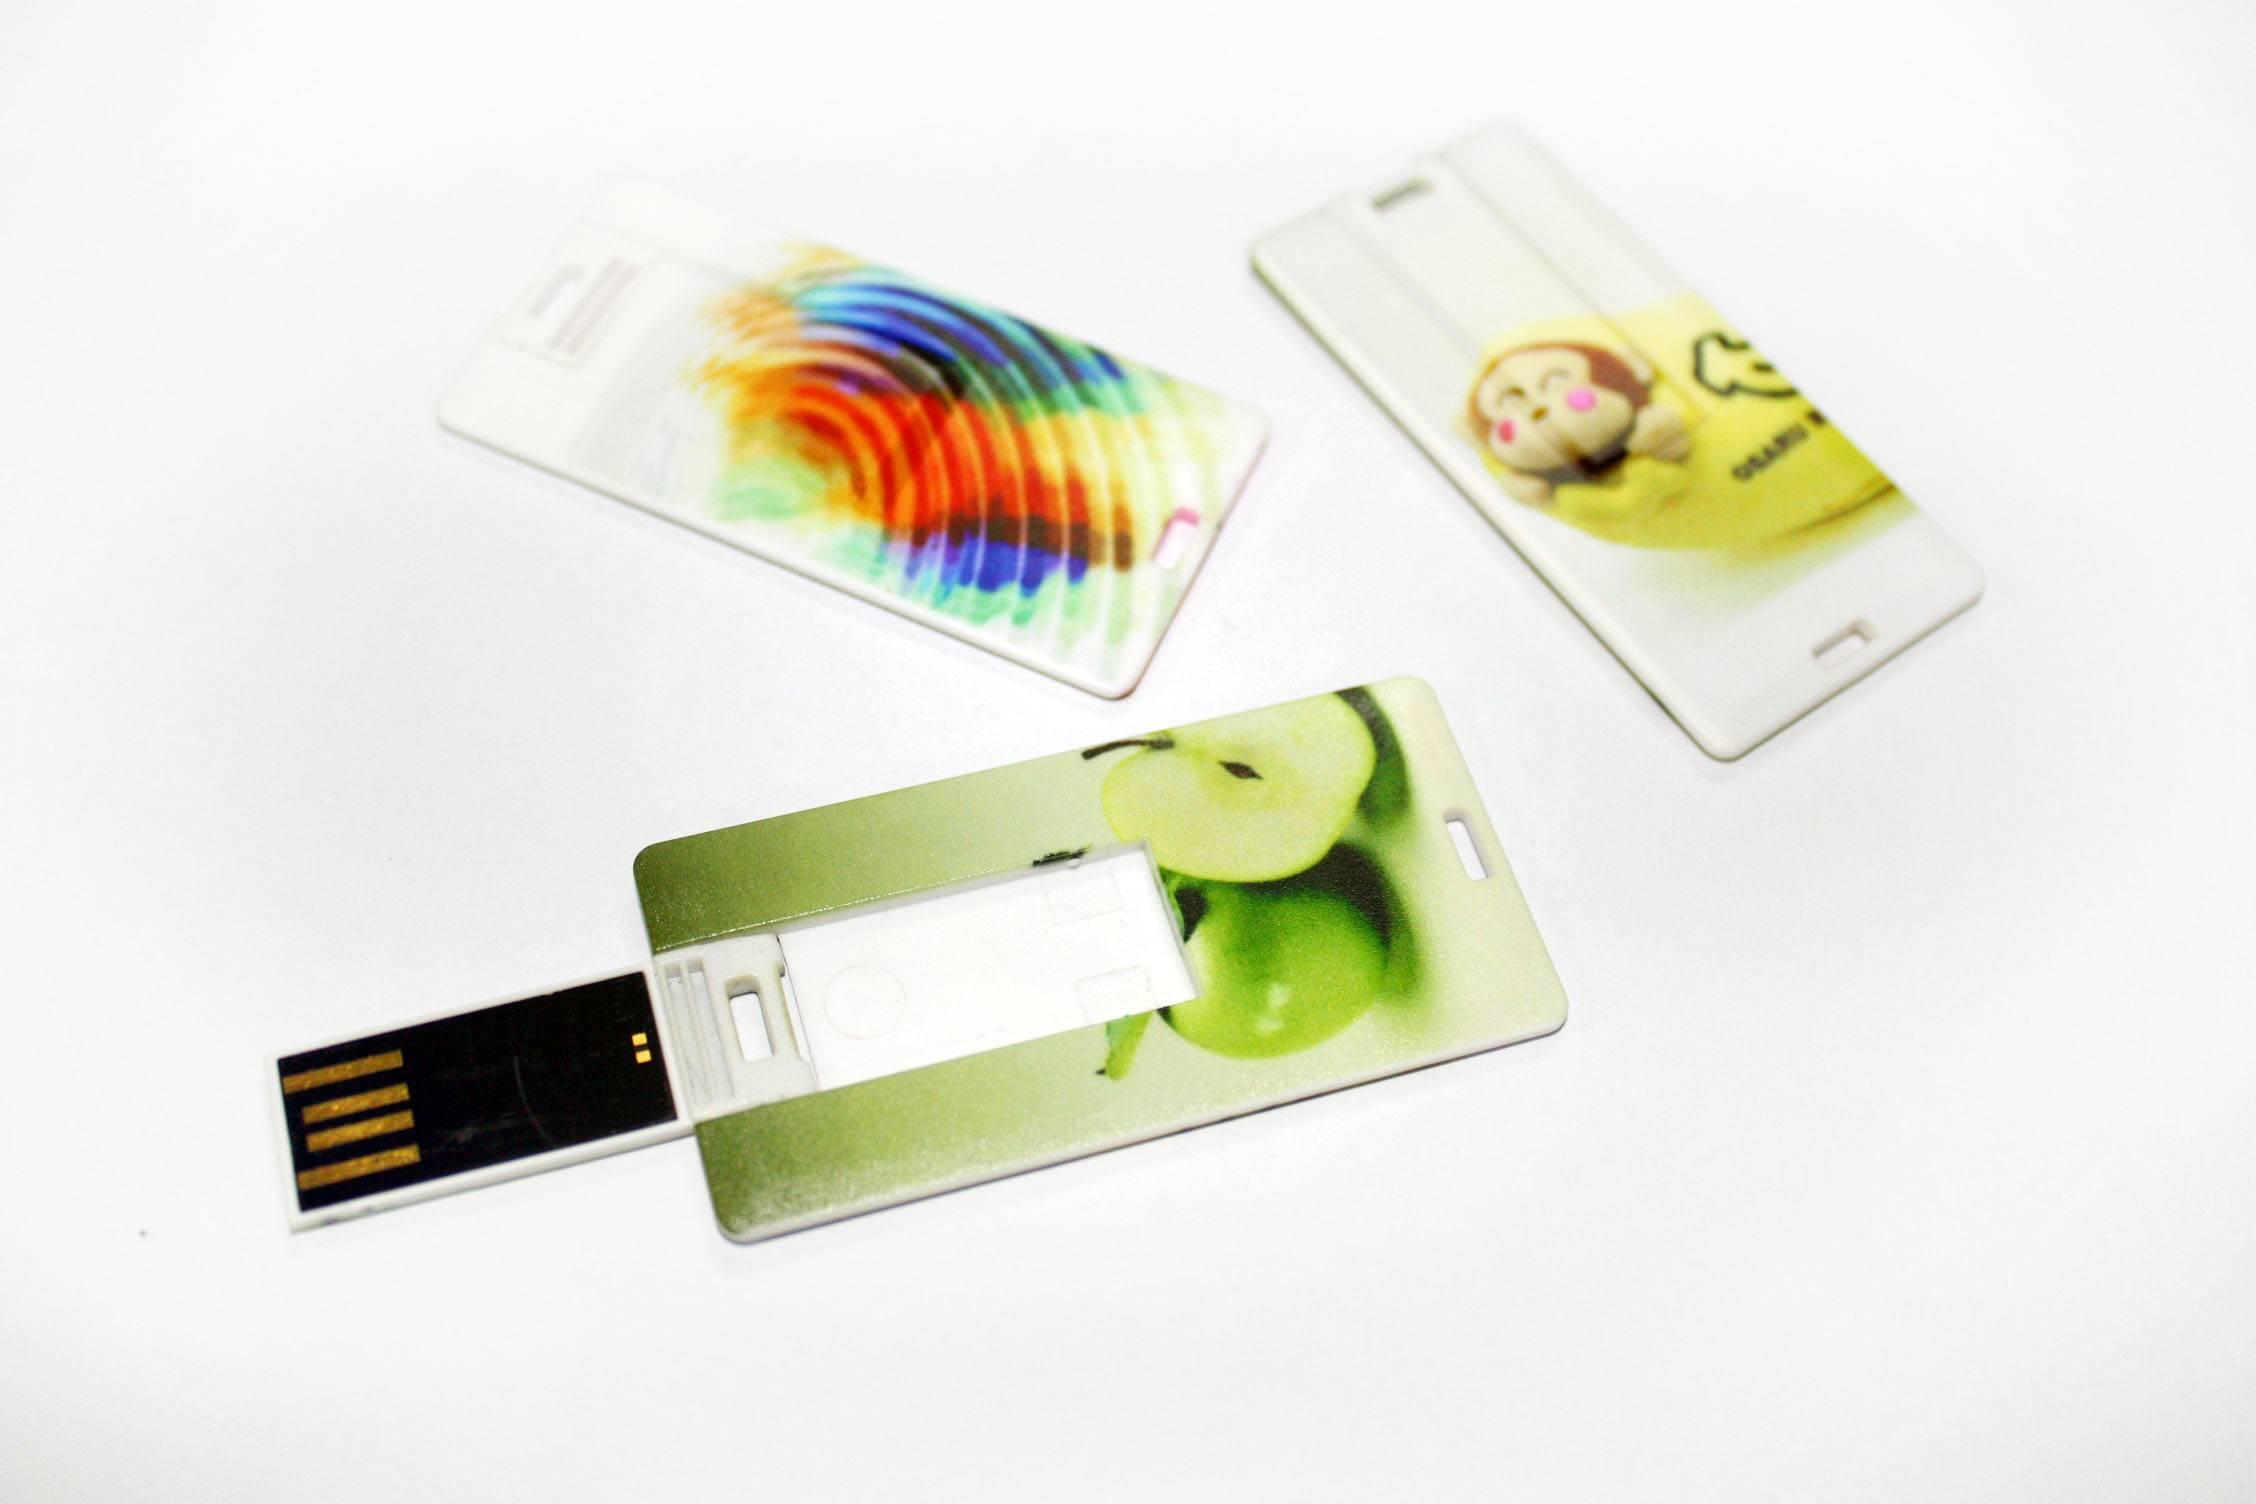 Credit Card-shaped USB Flash Drives